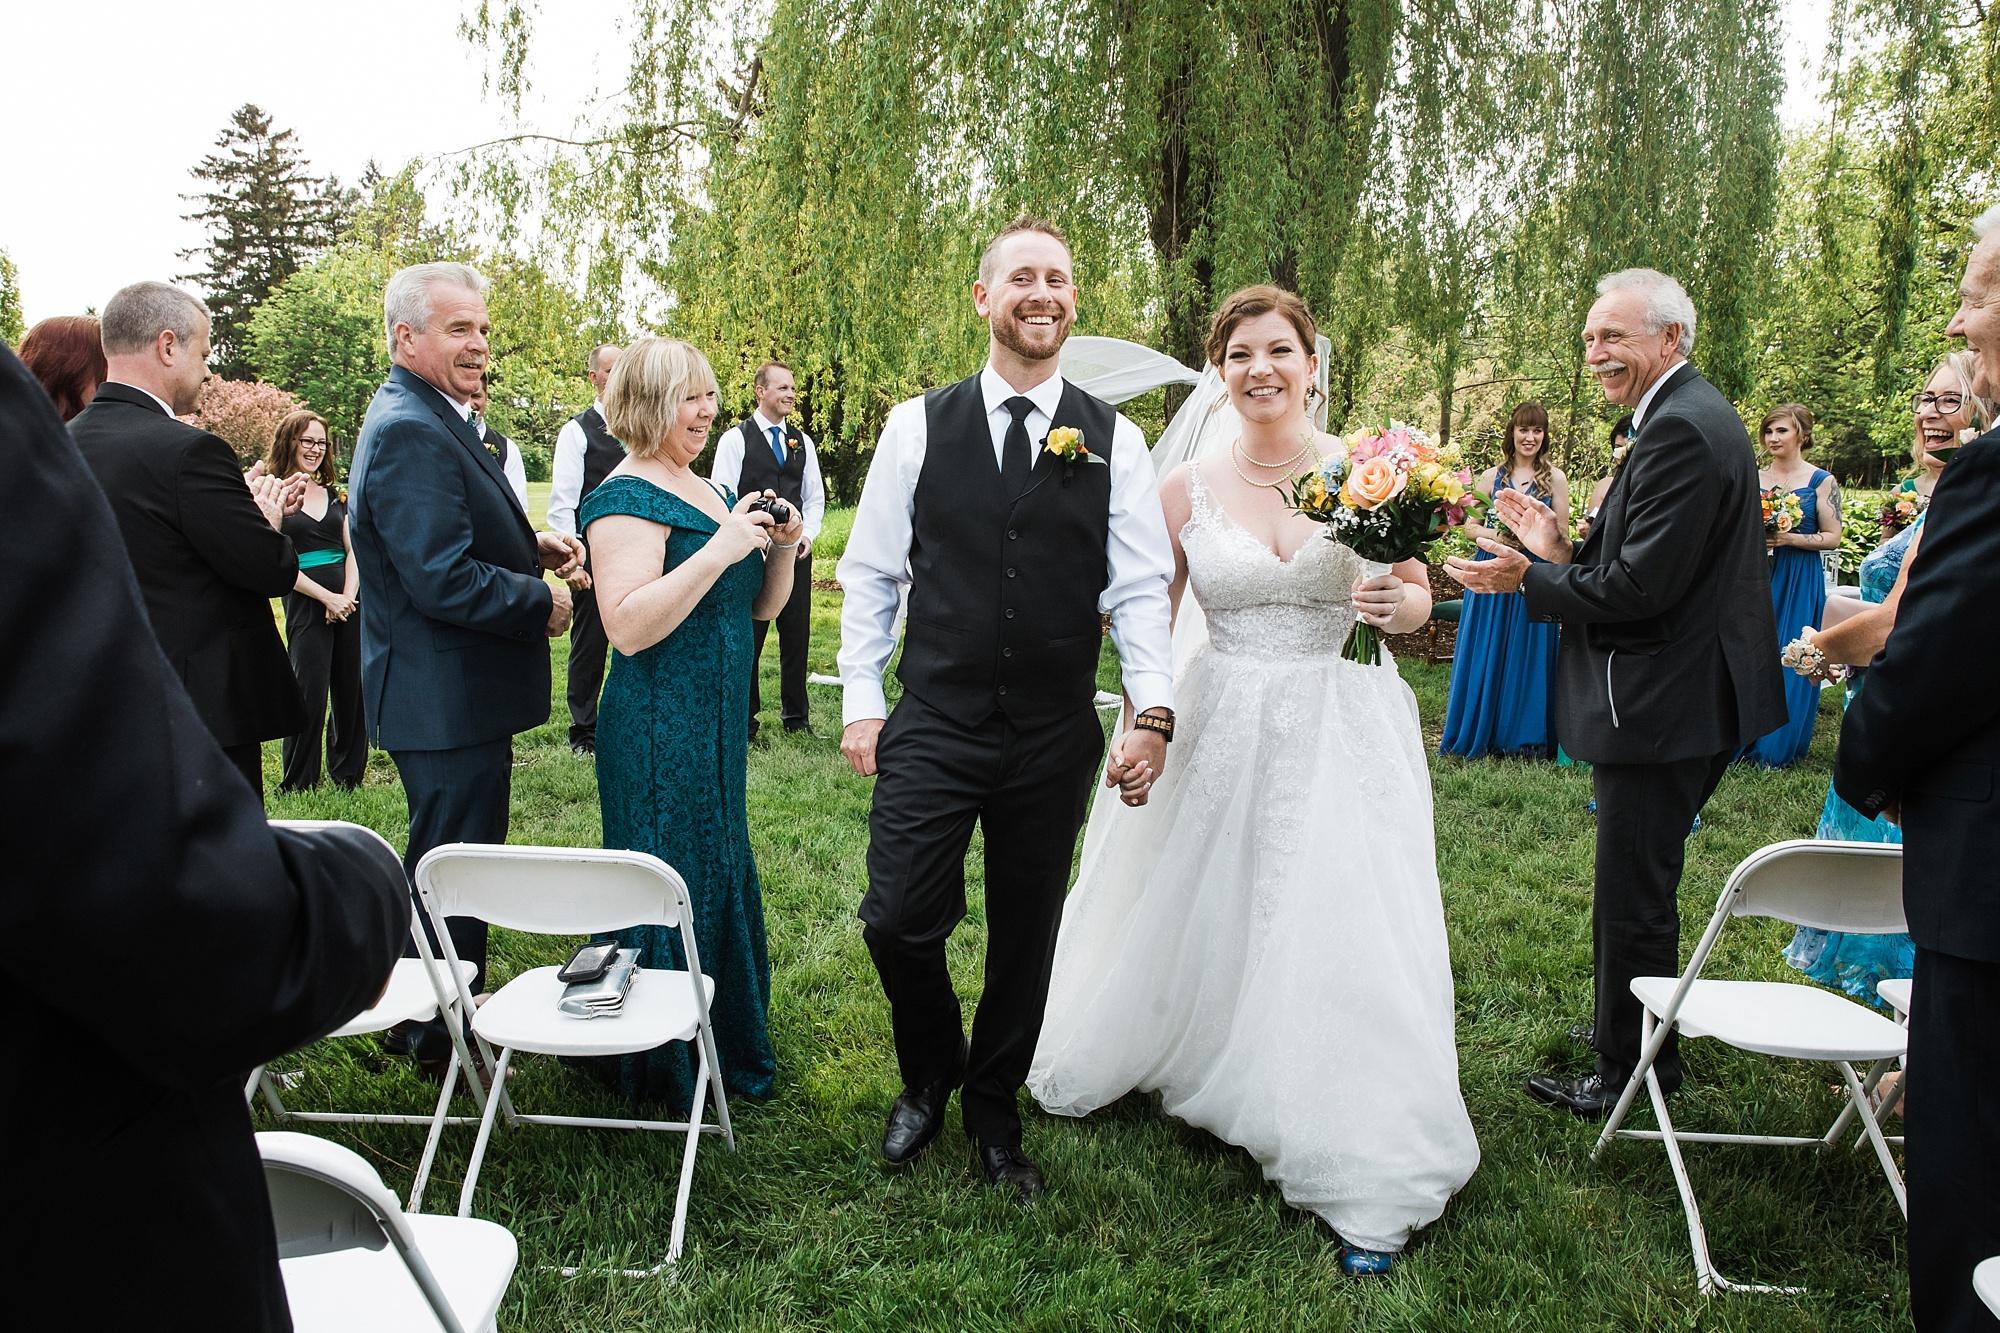 niagarafalls-weddingphotography_0023.jpg